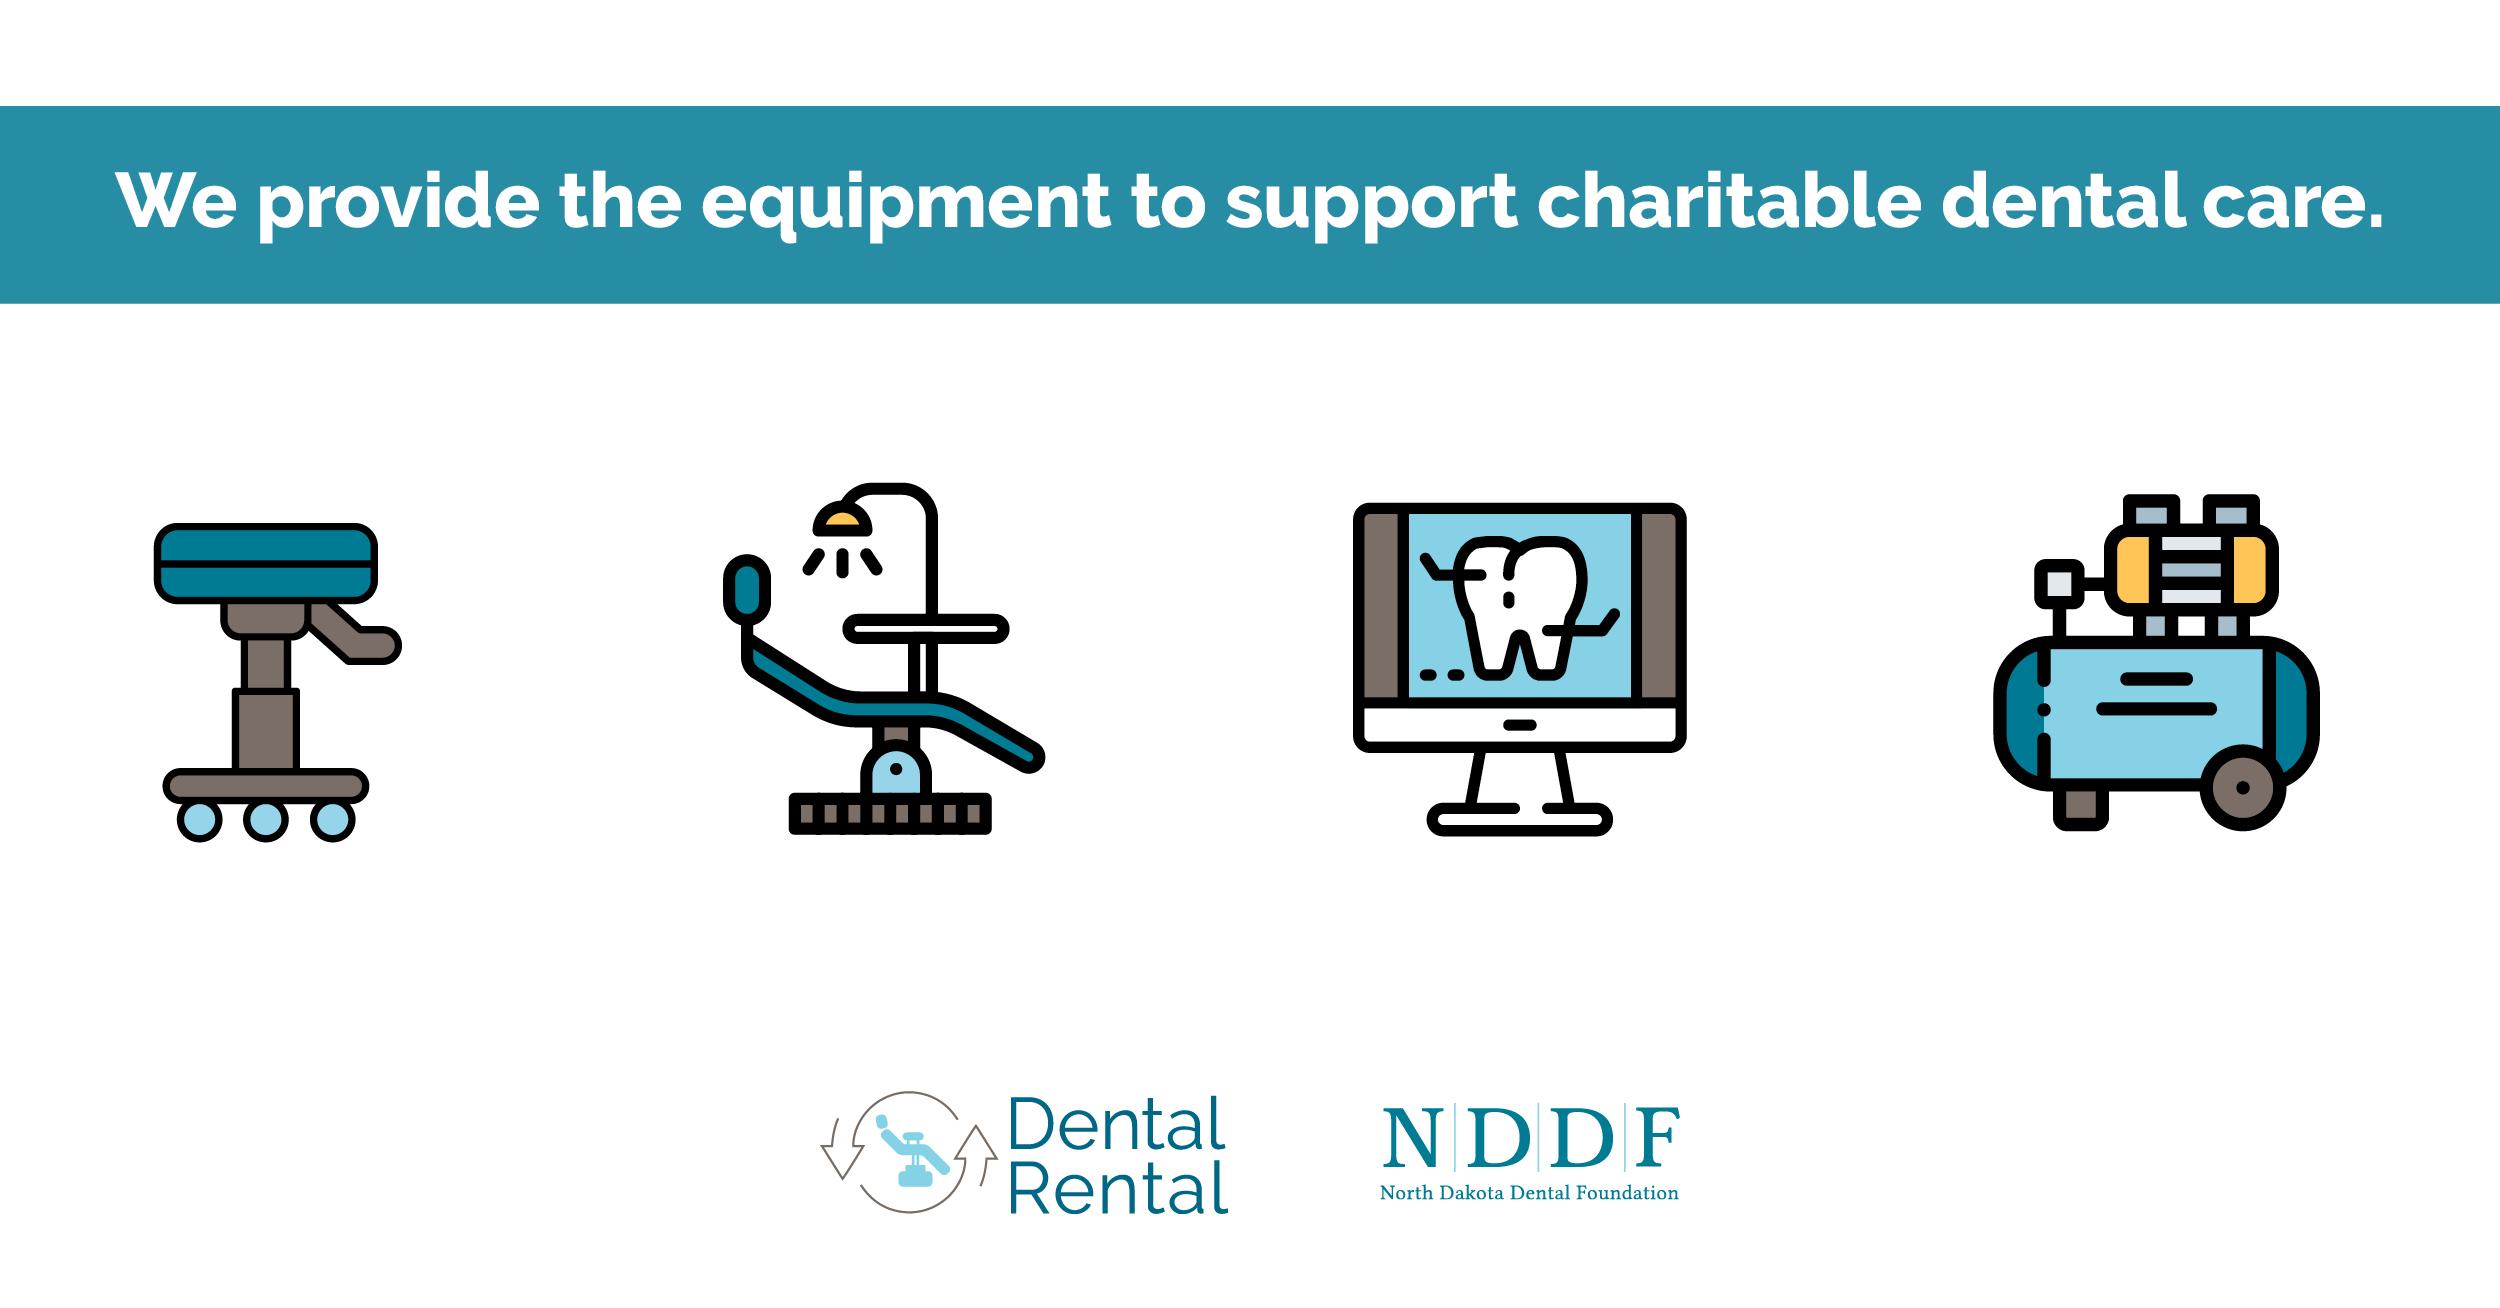 NDF-00007 FACEBOOK Oral health Month 1200x628_dental Rental3